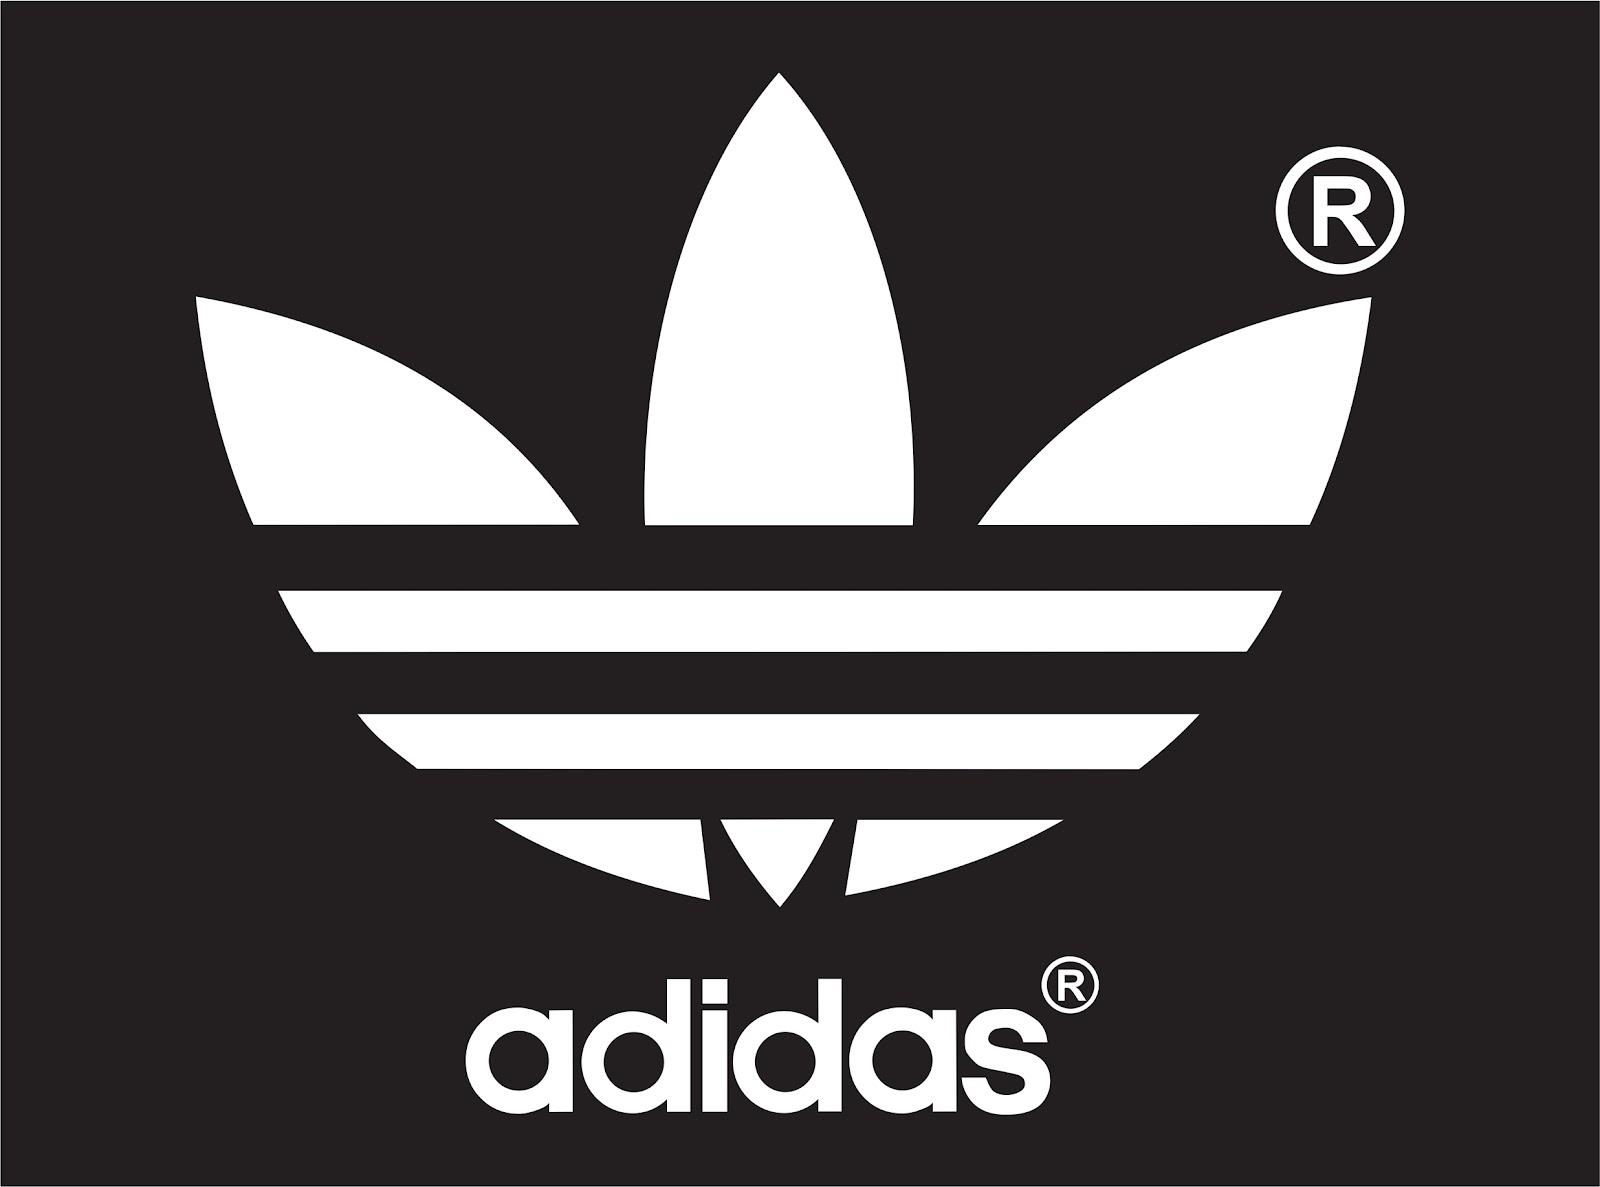 Premier All Logos: LOGOS ADIDAS